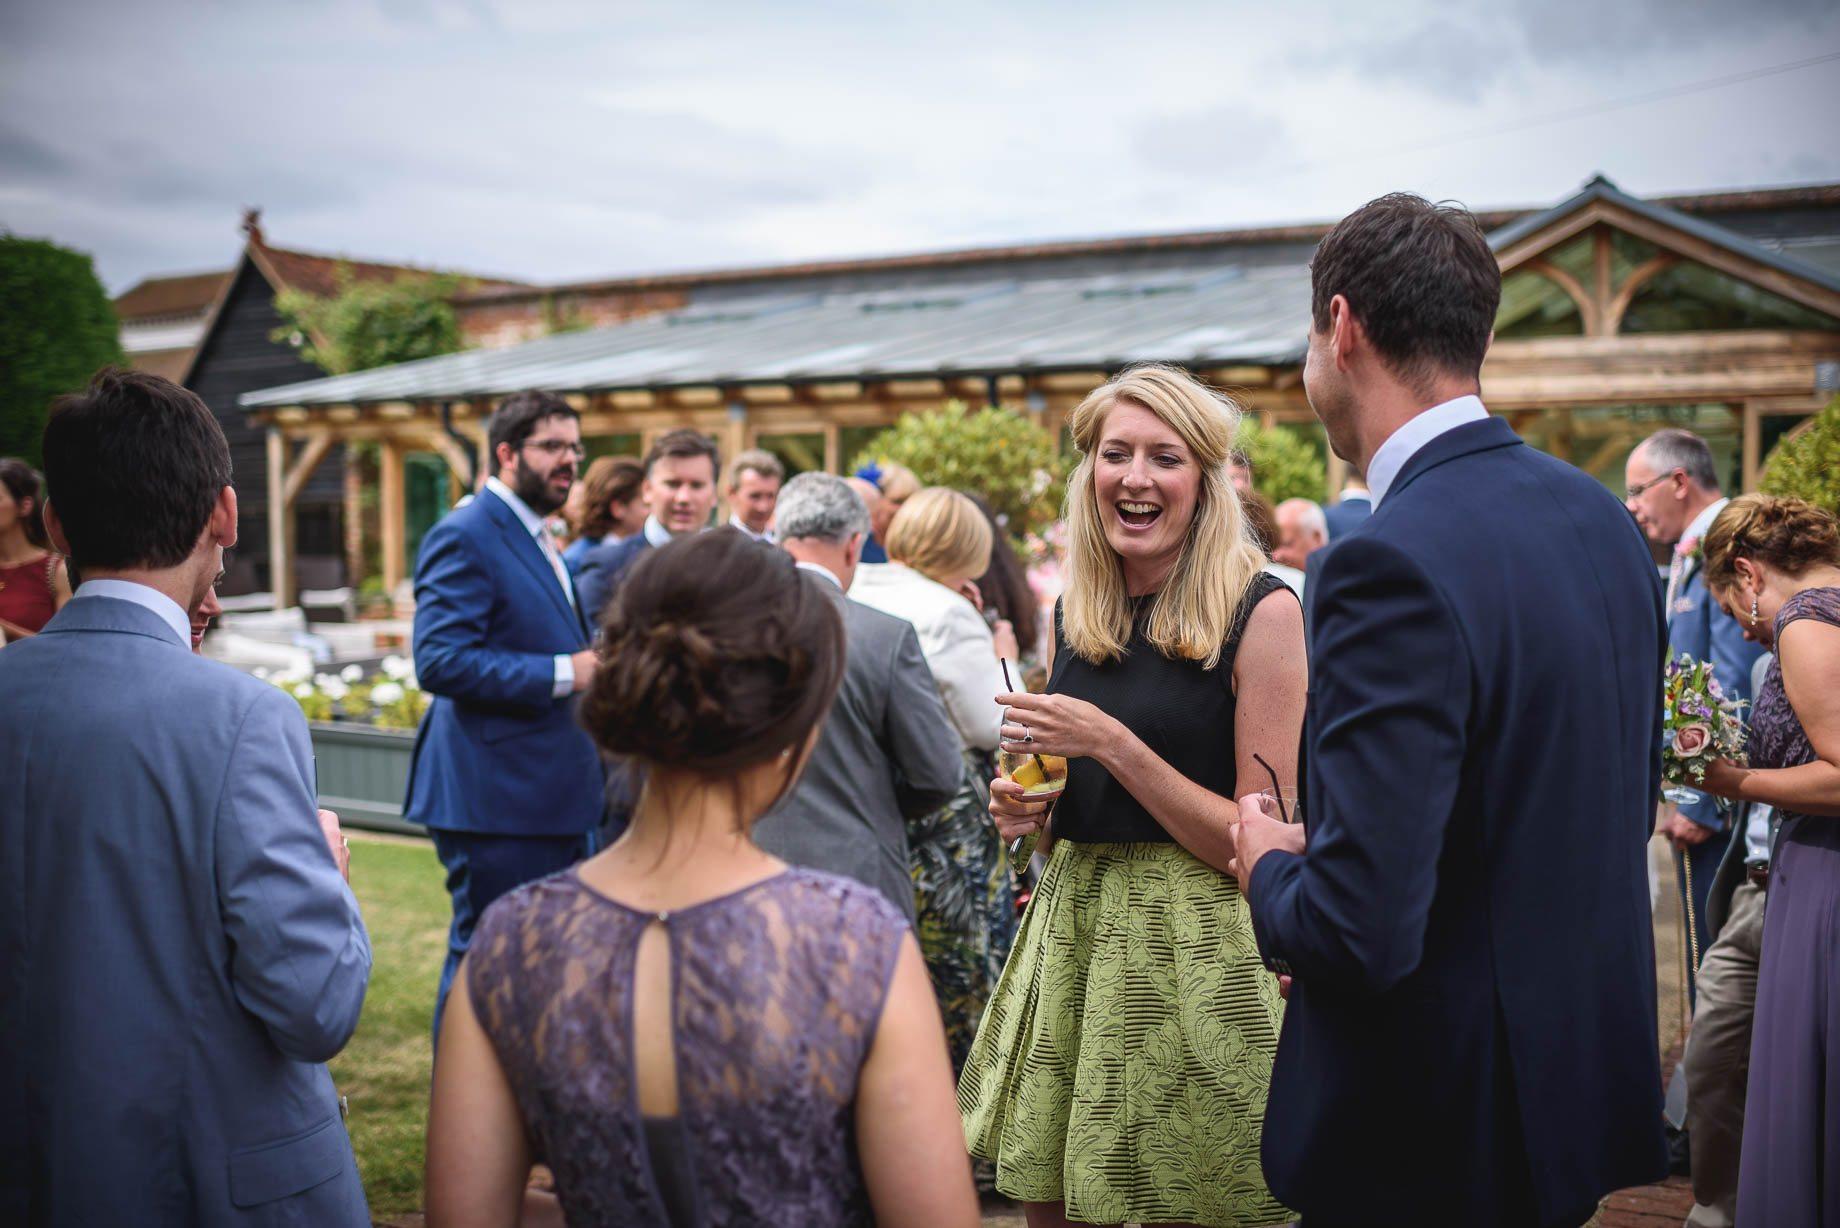 Gaynes Park wedding photography - Guy Collier Photography - Rachel and Jon (86 of 169)